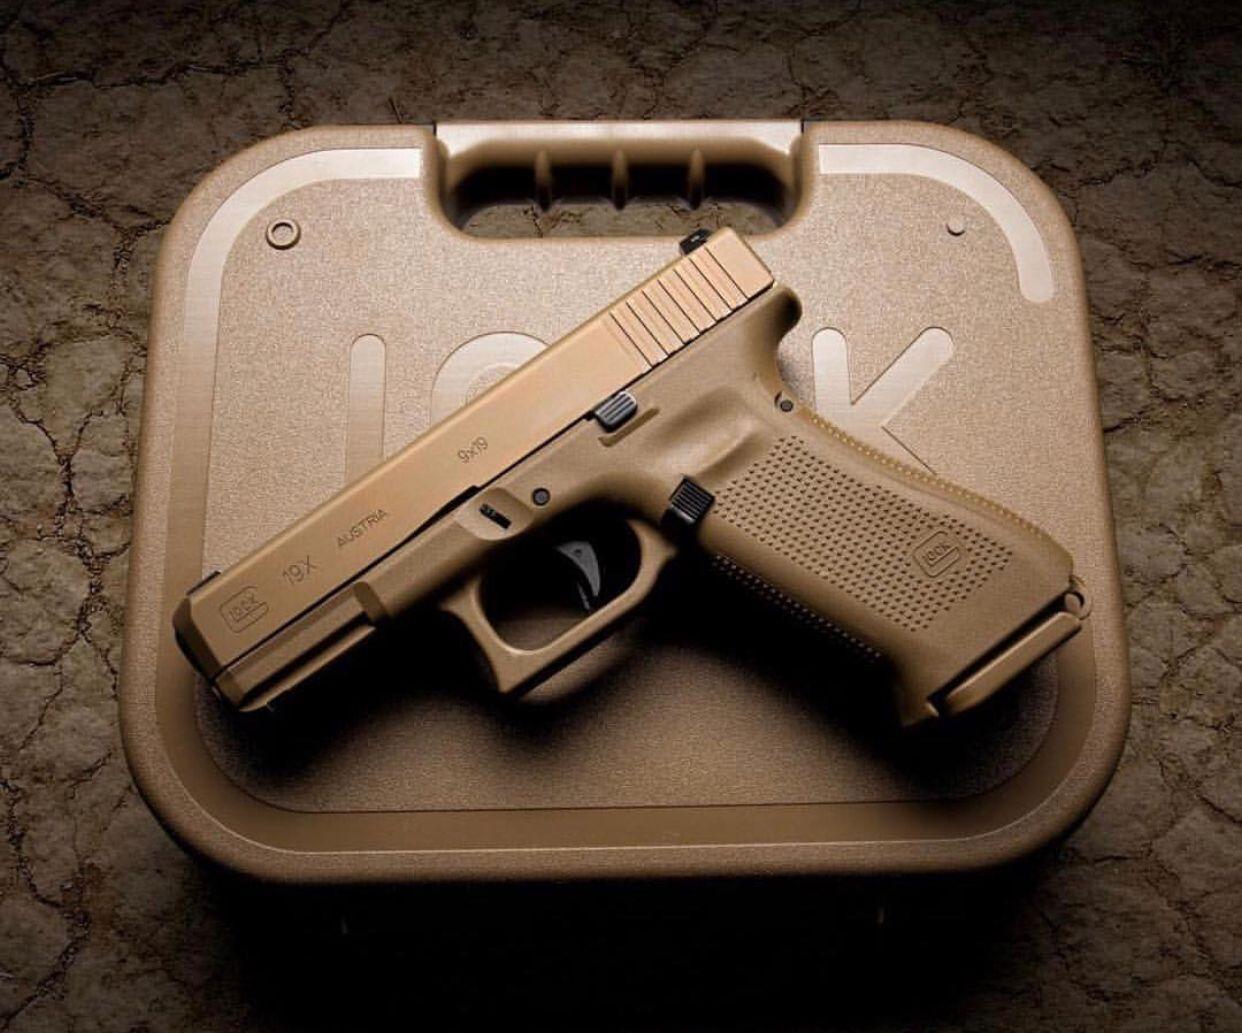 Glock 19X | Glock | Hand guns, Glock mods, Guns